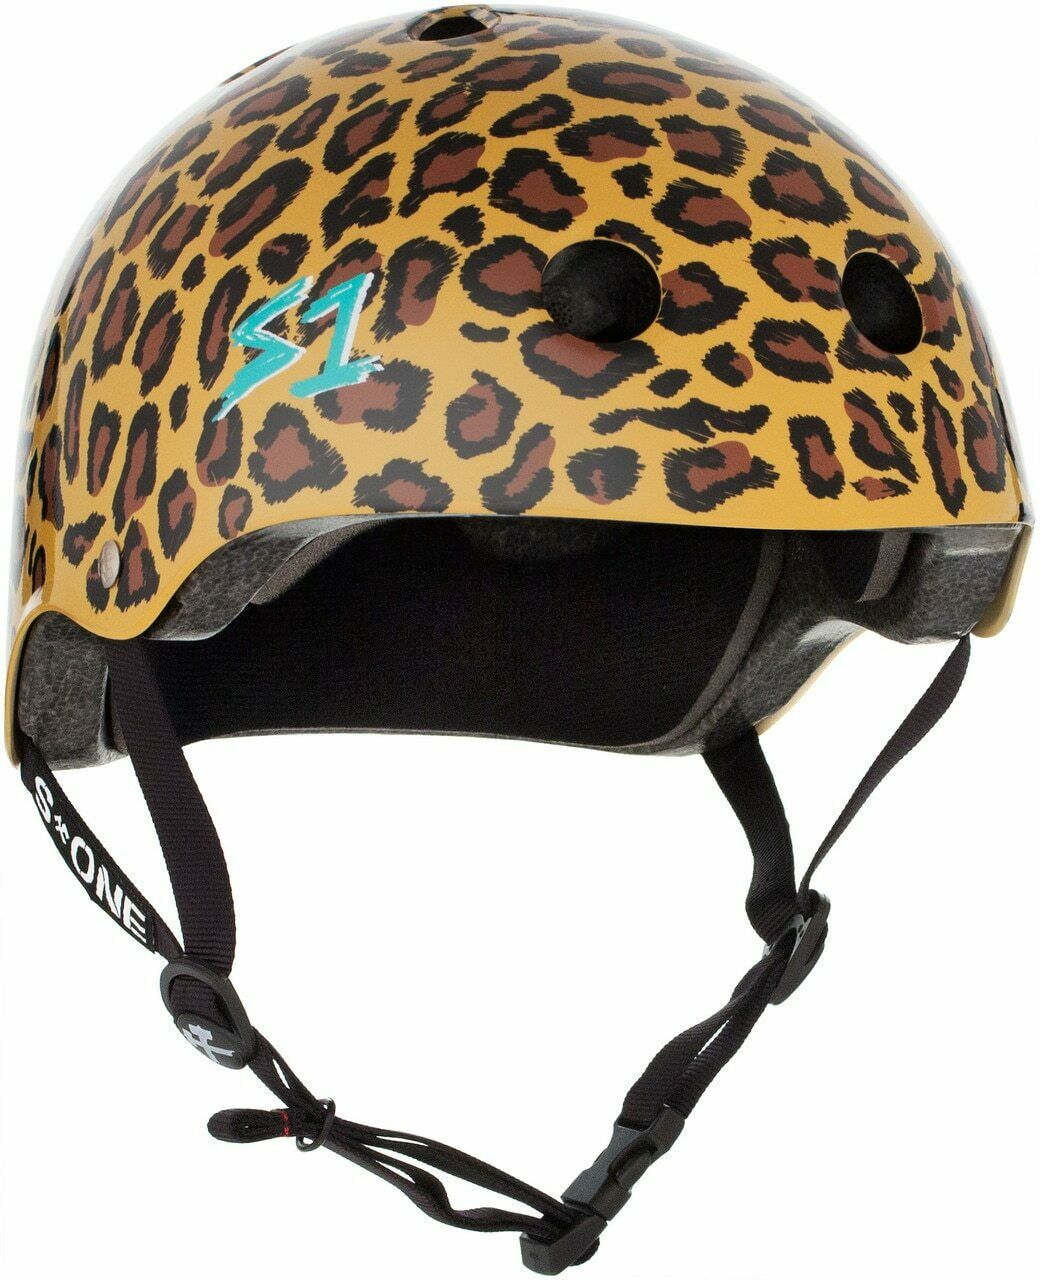 S1 Lifer Helmet - Moxi Leopard Print